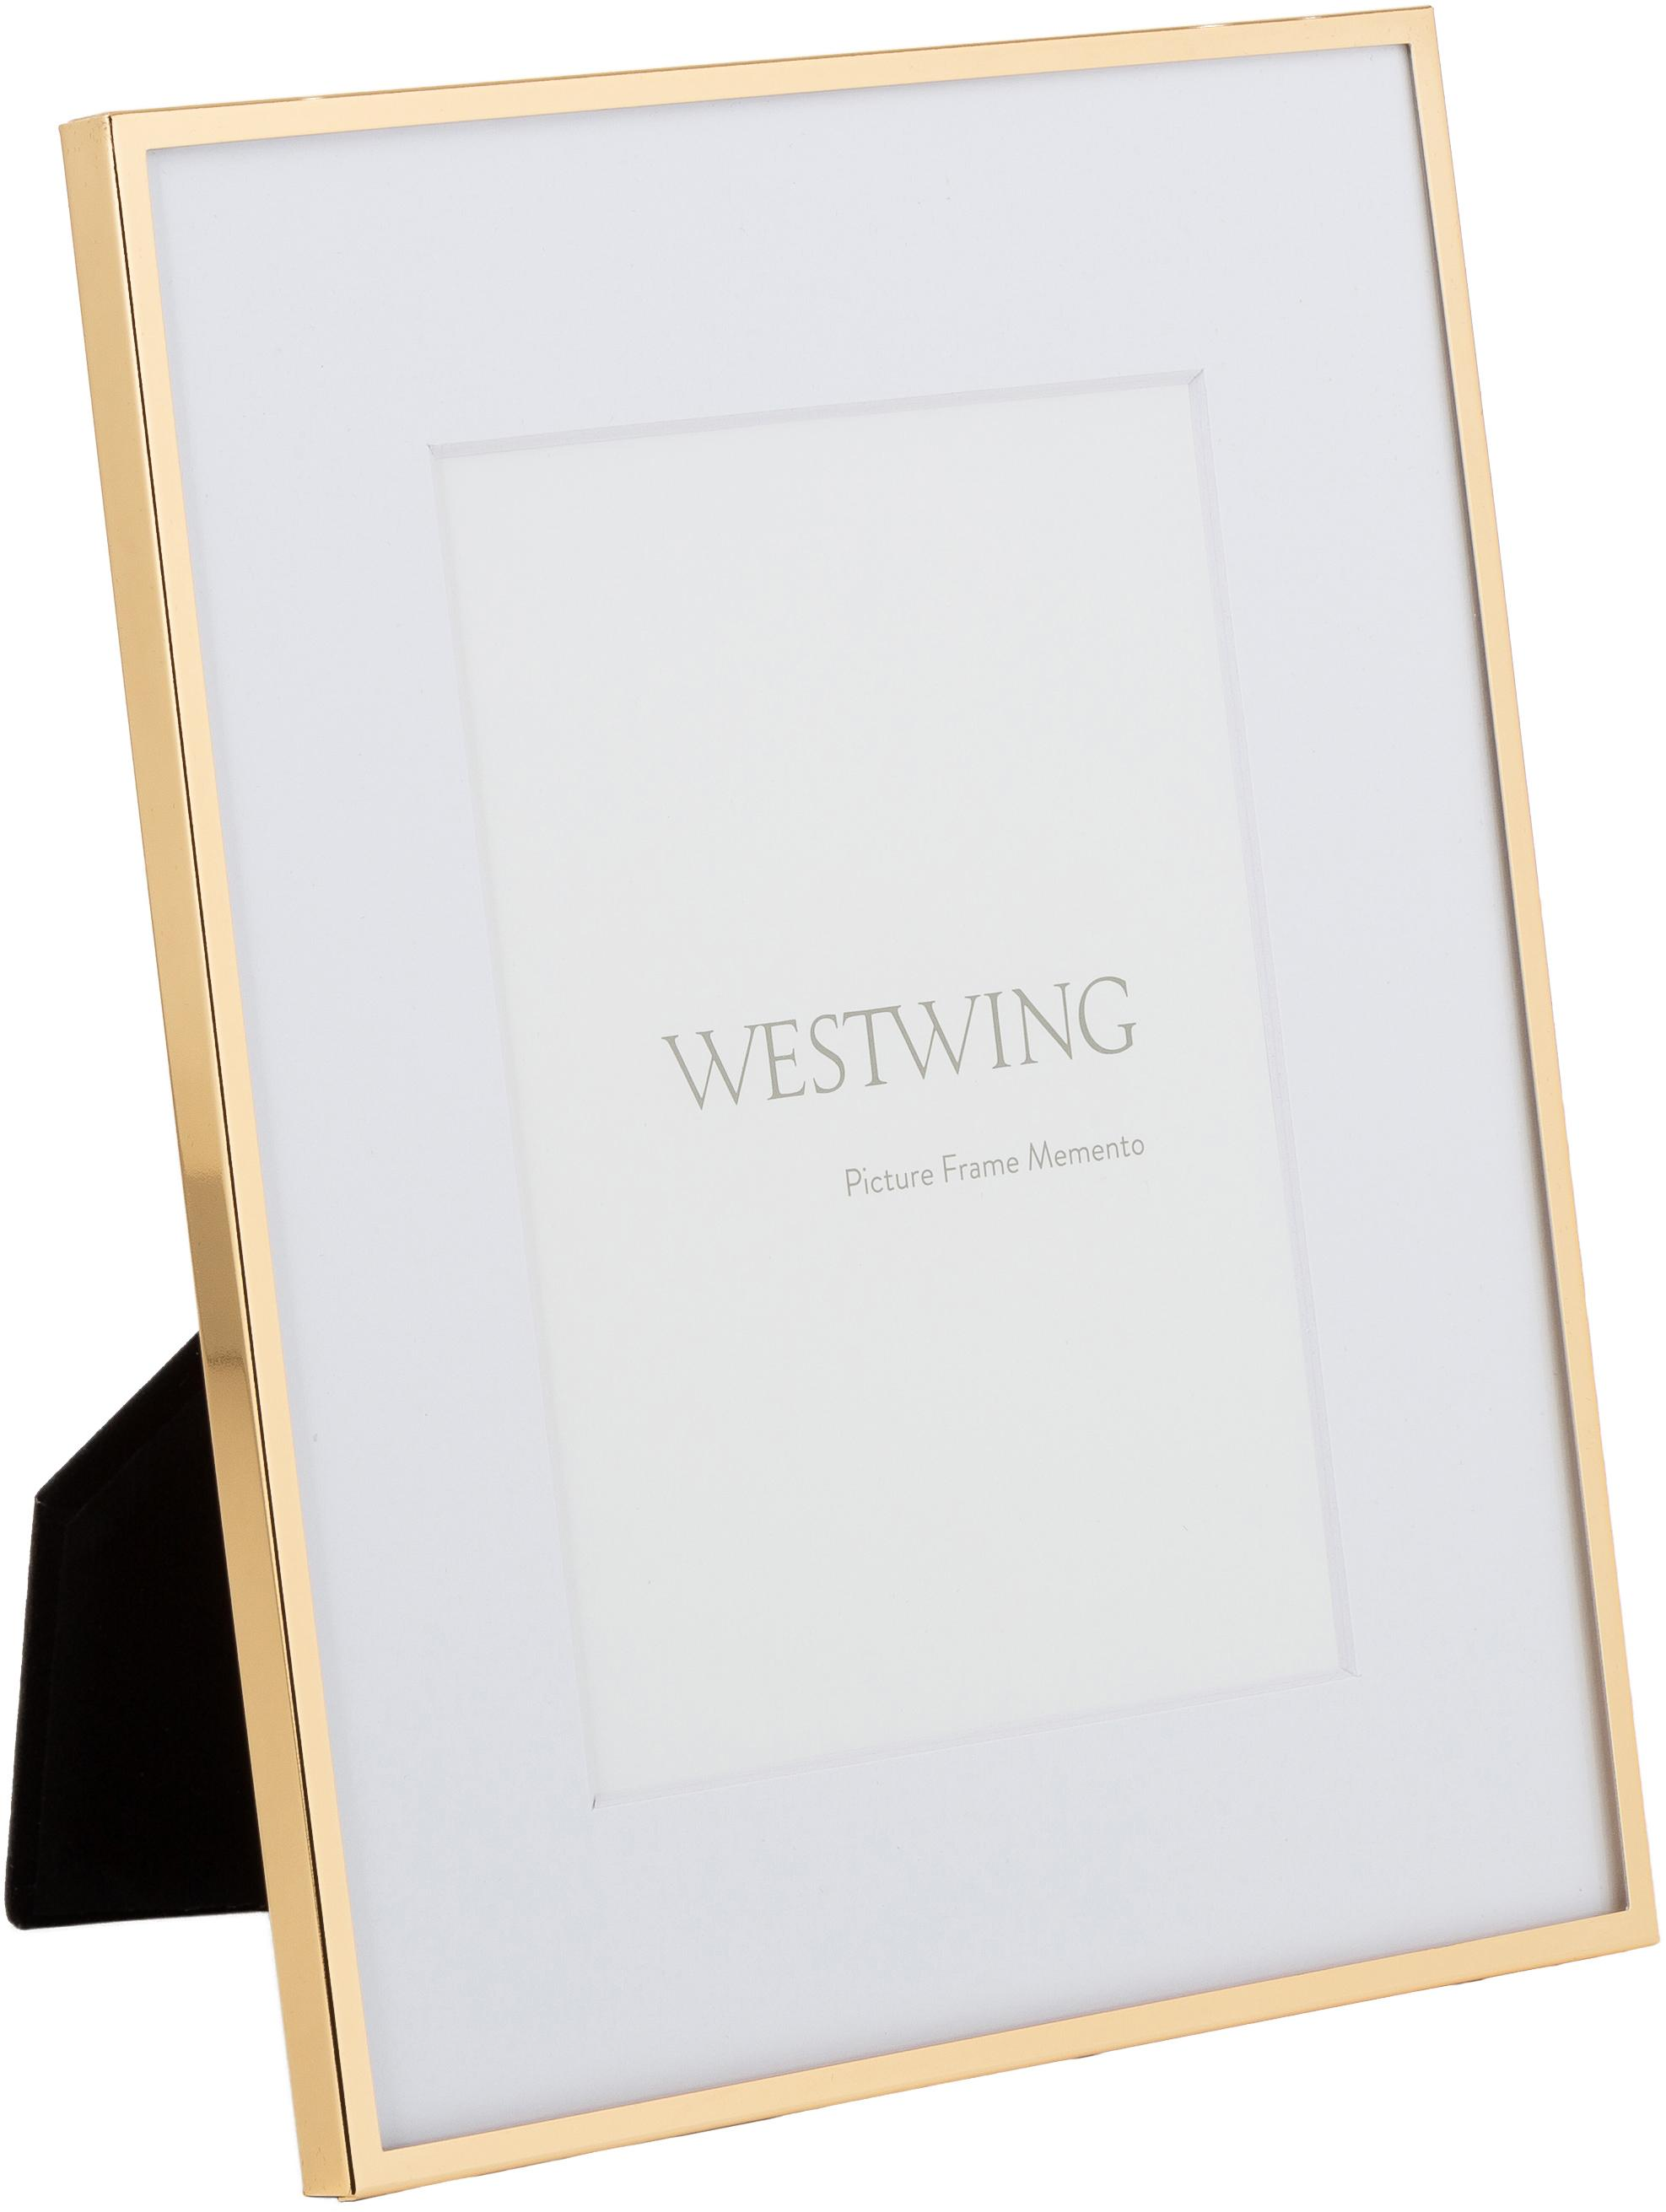 Marco Memento, Parte trasera: tablero de fibras de dens, Dorado, 13 x 18 cm